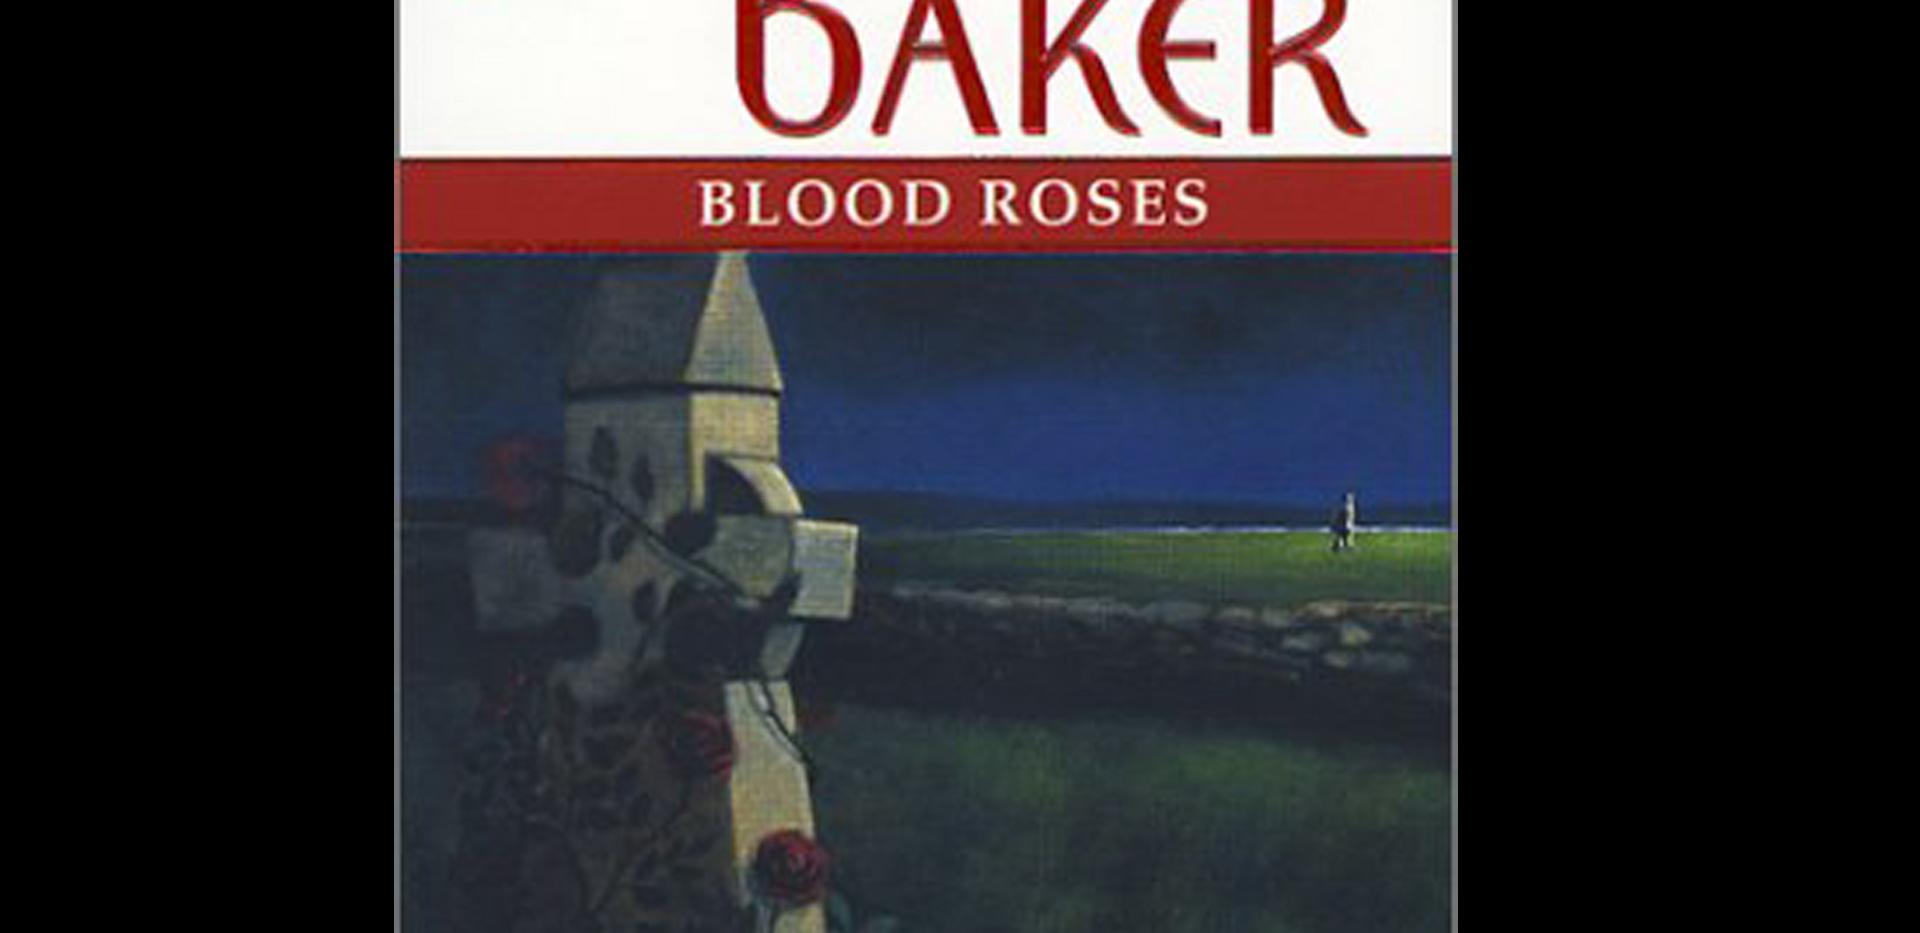 bloodroses.png